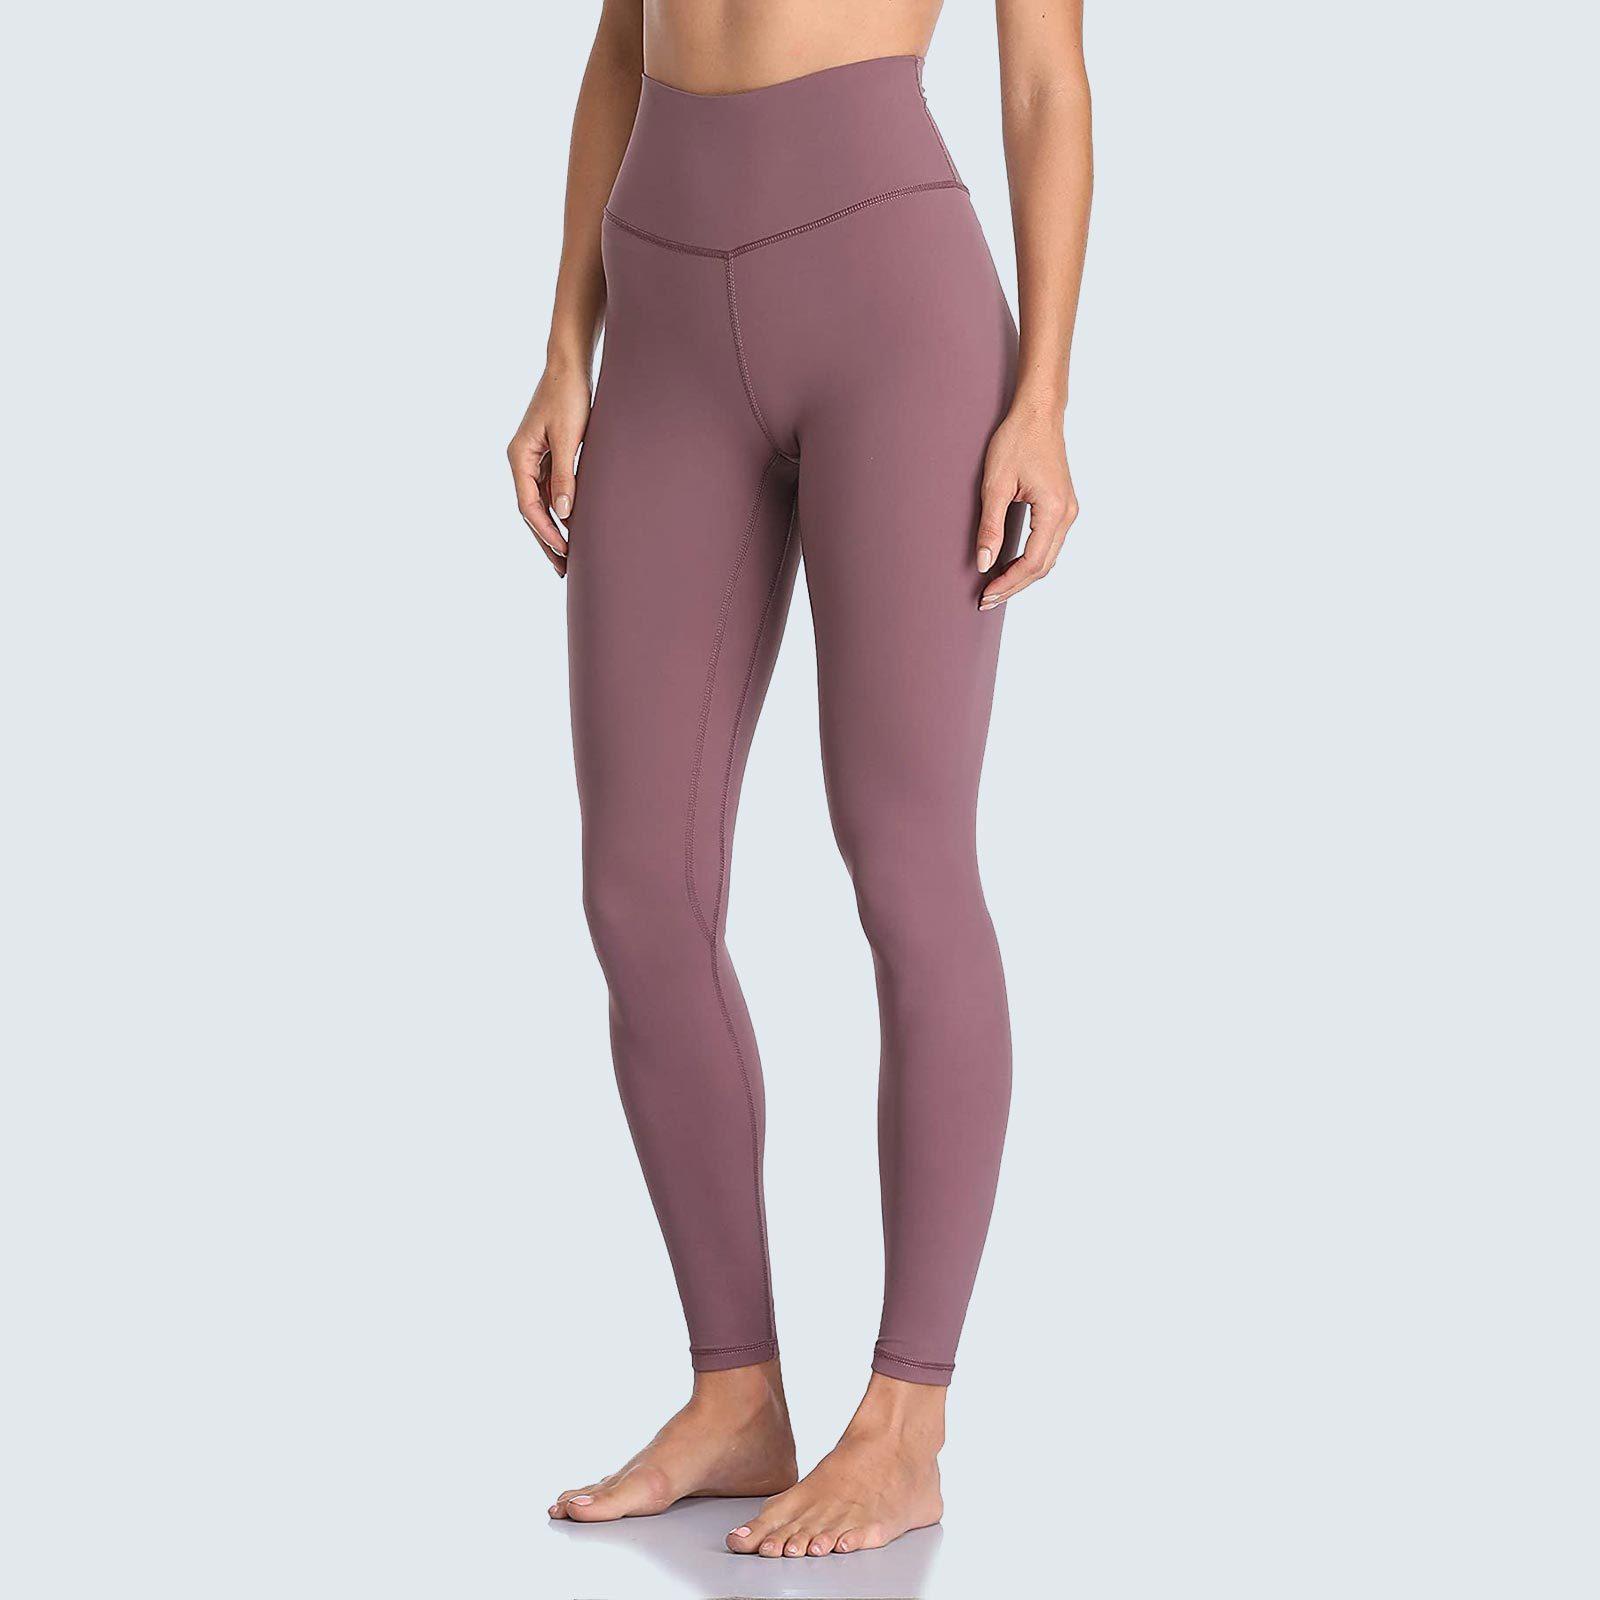 Best leggings for medium-intensity workouts: Colorfulkoala Yoga Pants